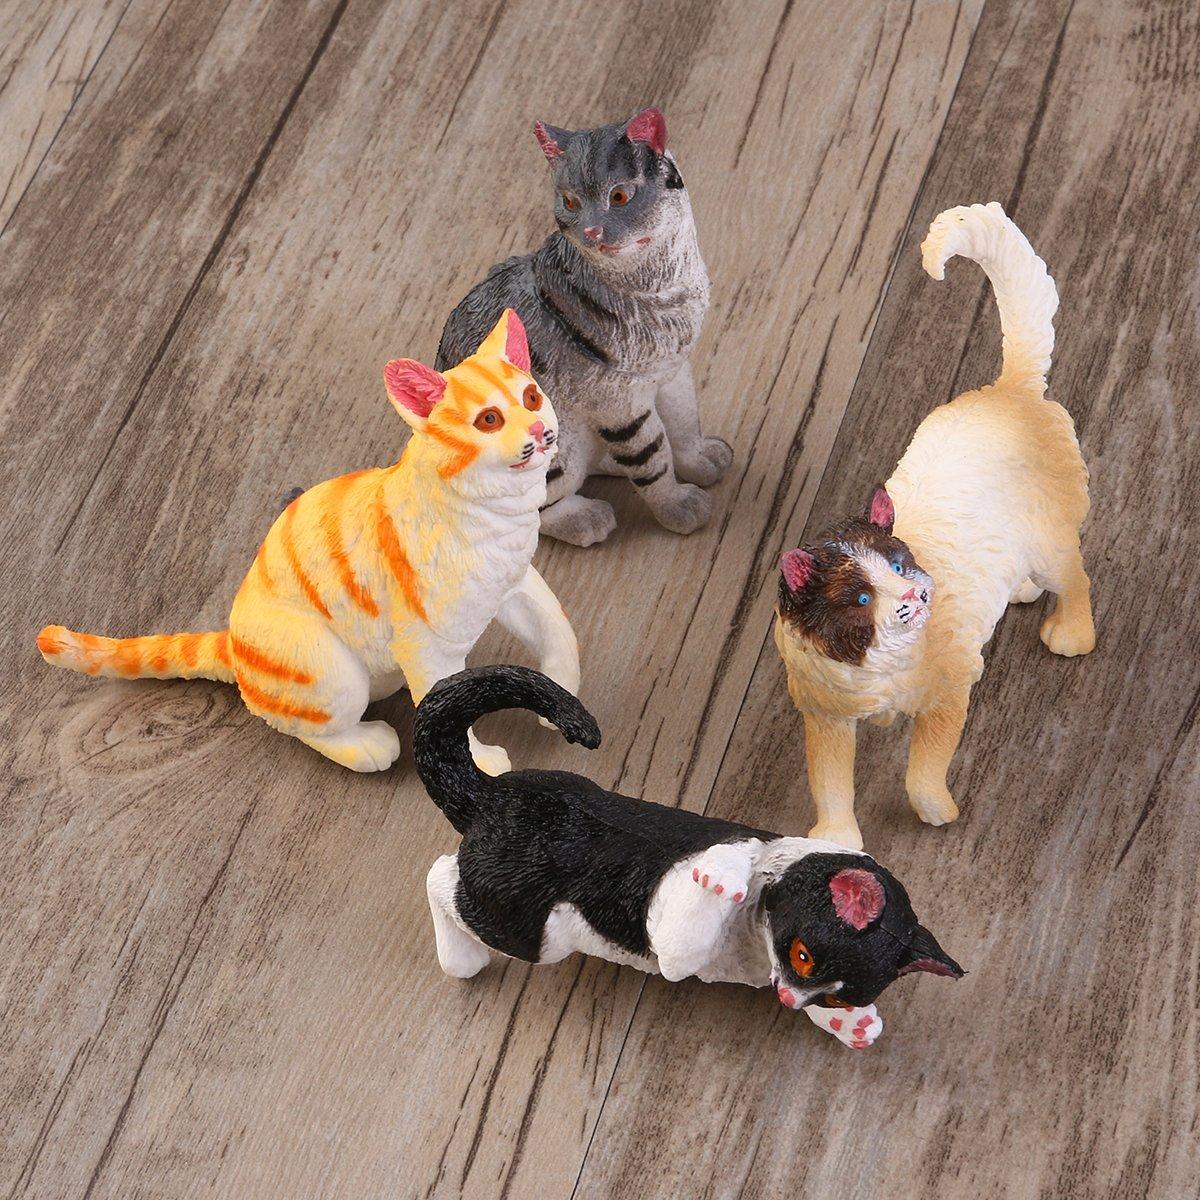 TOYMYTOY Figuras de animales Figuras Modelos Gatos - 4 Piezas